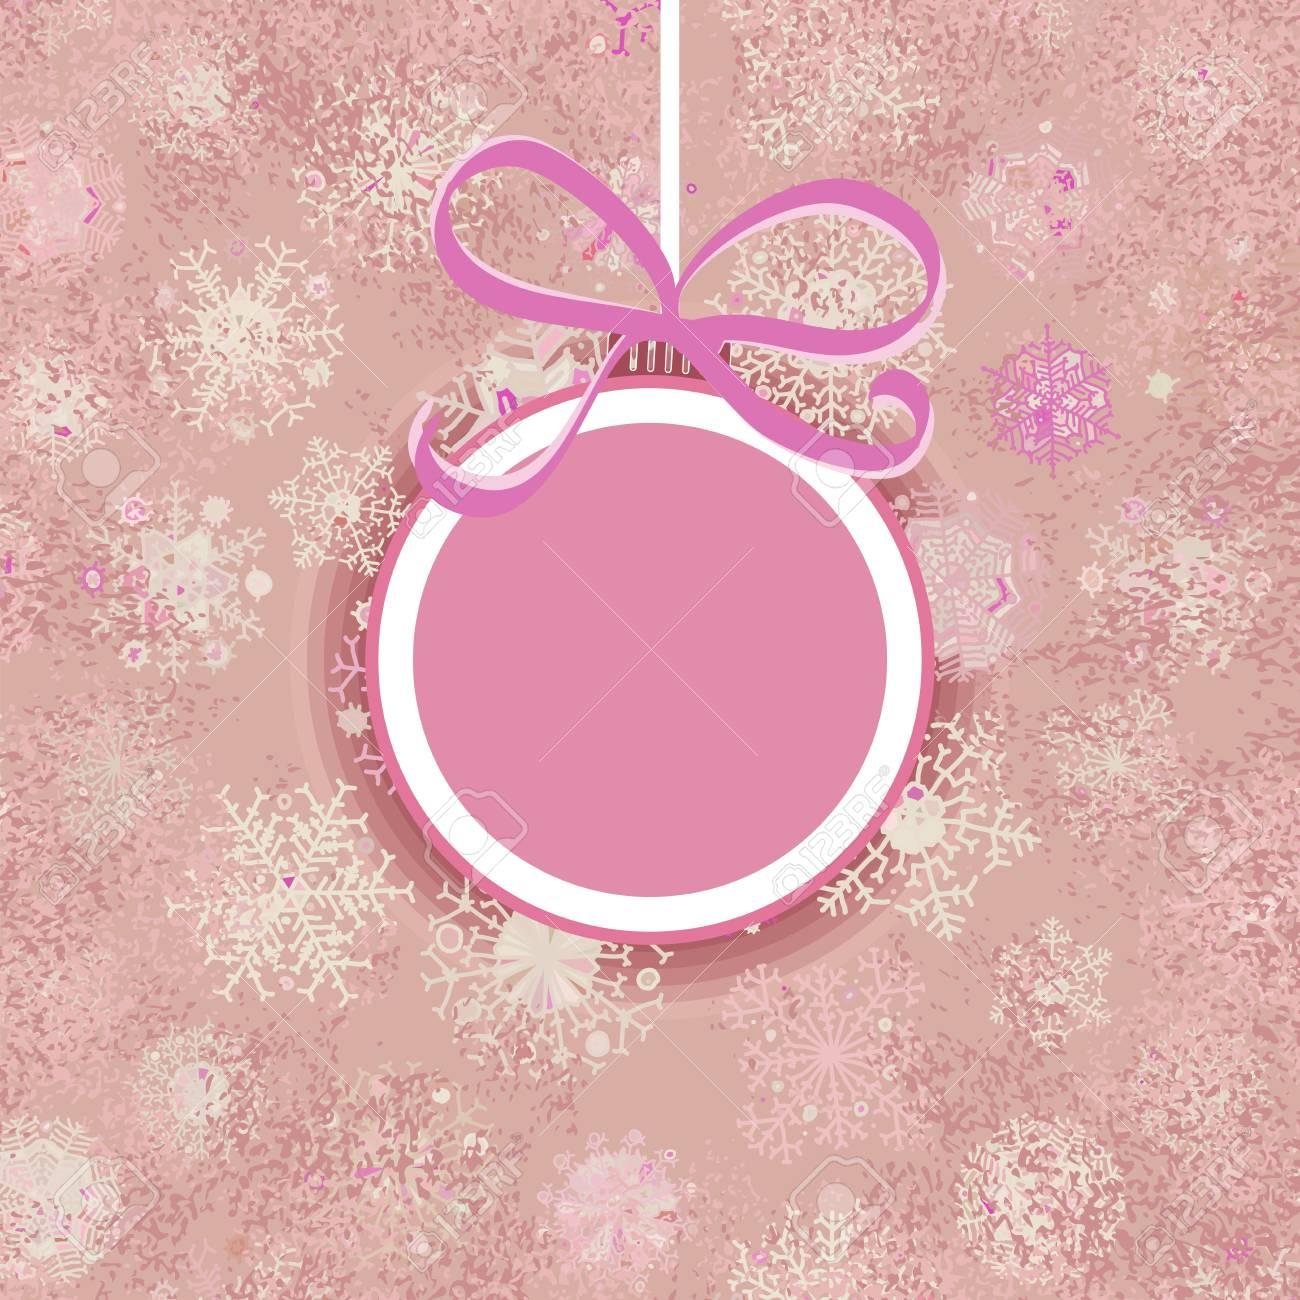 Retro Christmas ornaments     EPS8 Stock Vector - 17525454